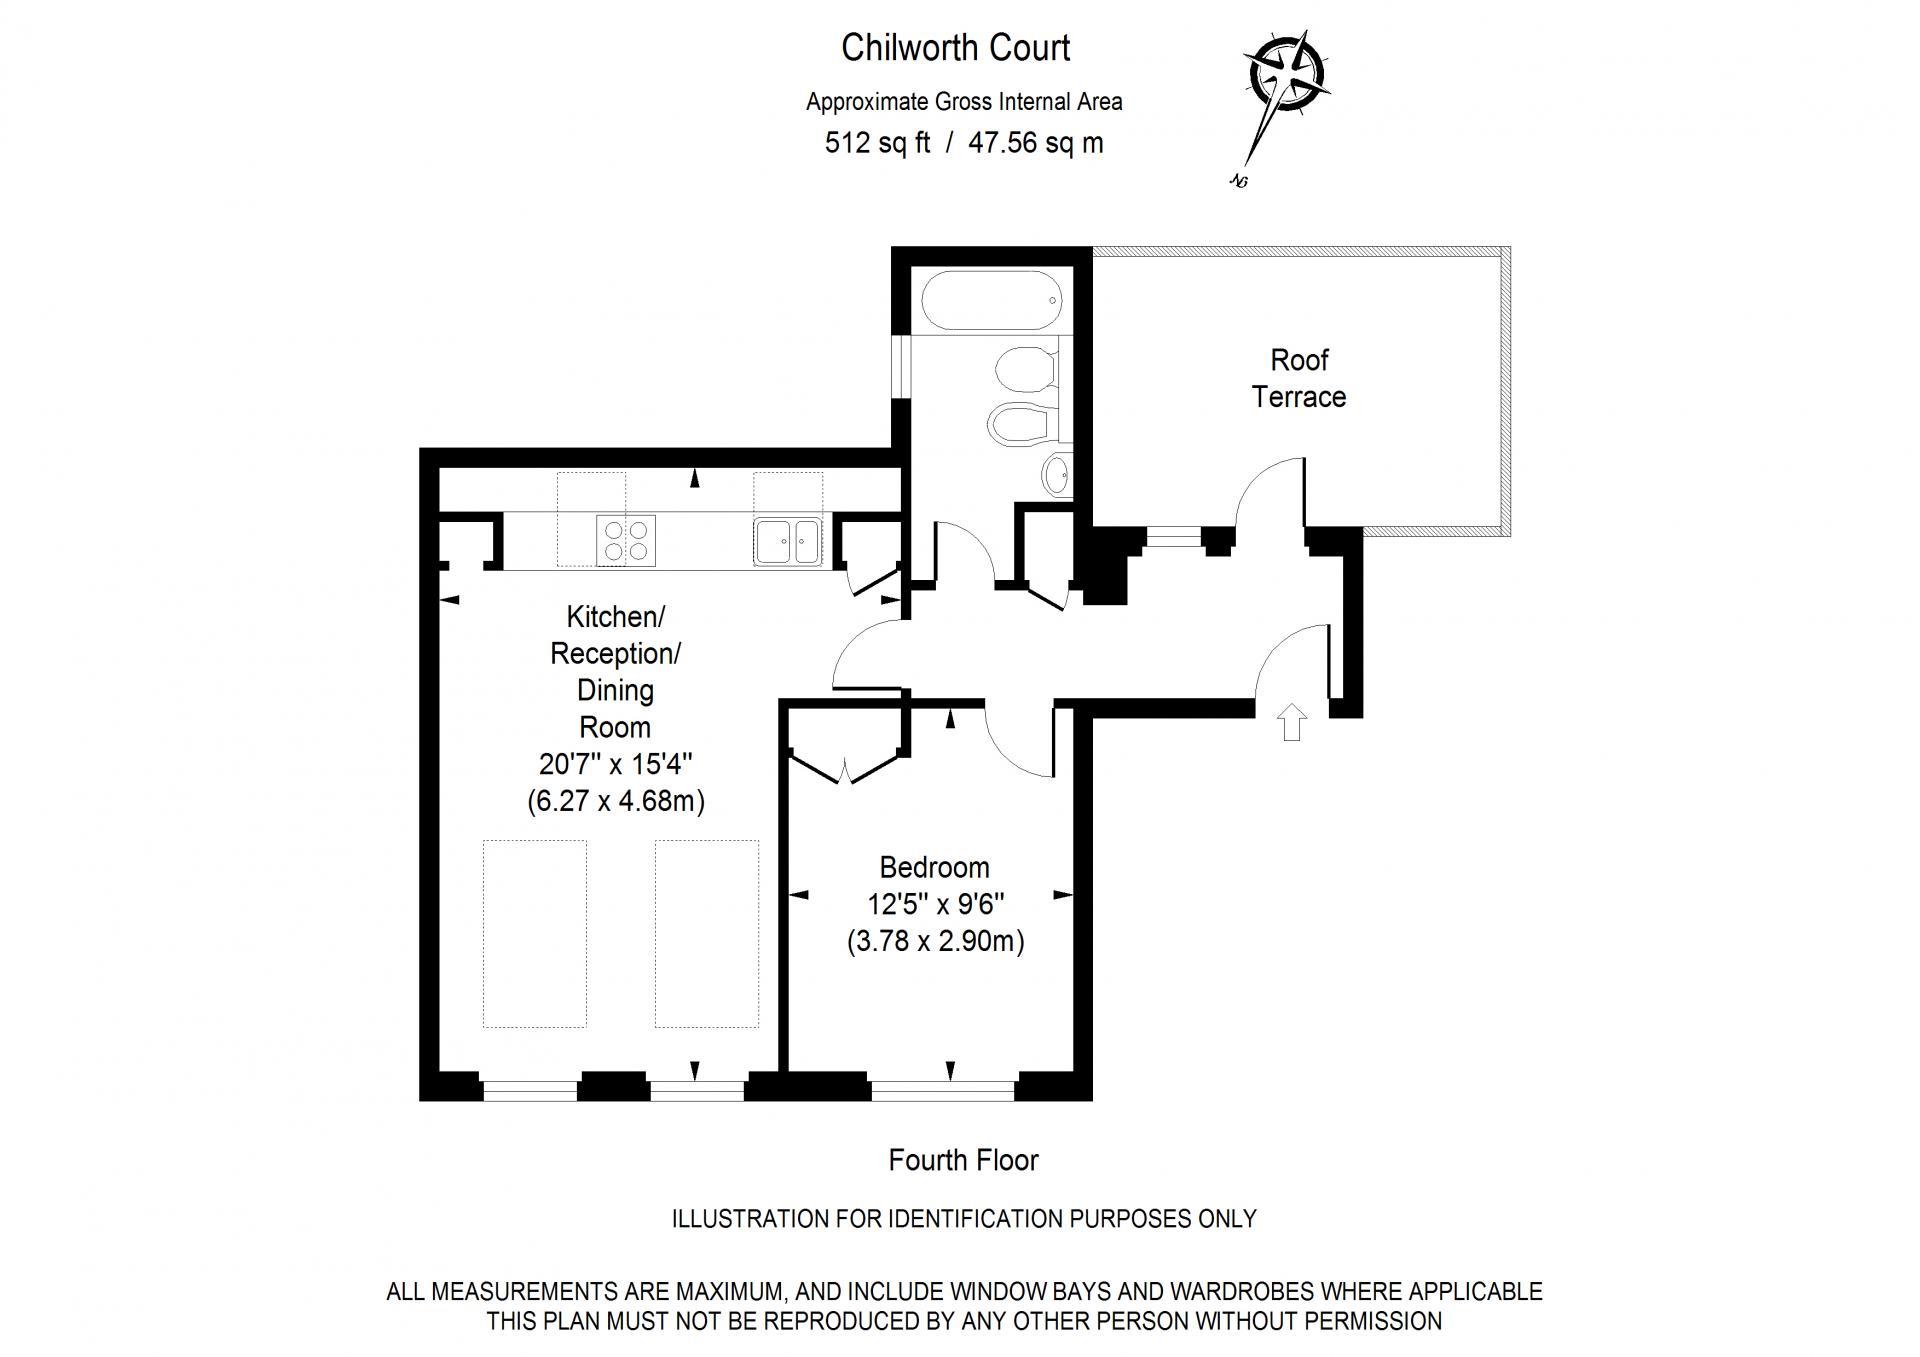 Superior 1 bed floor plan of Chilworth Court Serviced Apartments, Paddington, London